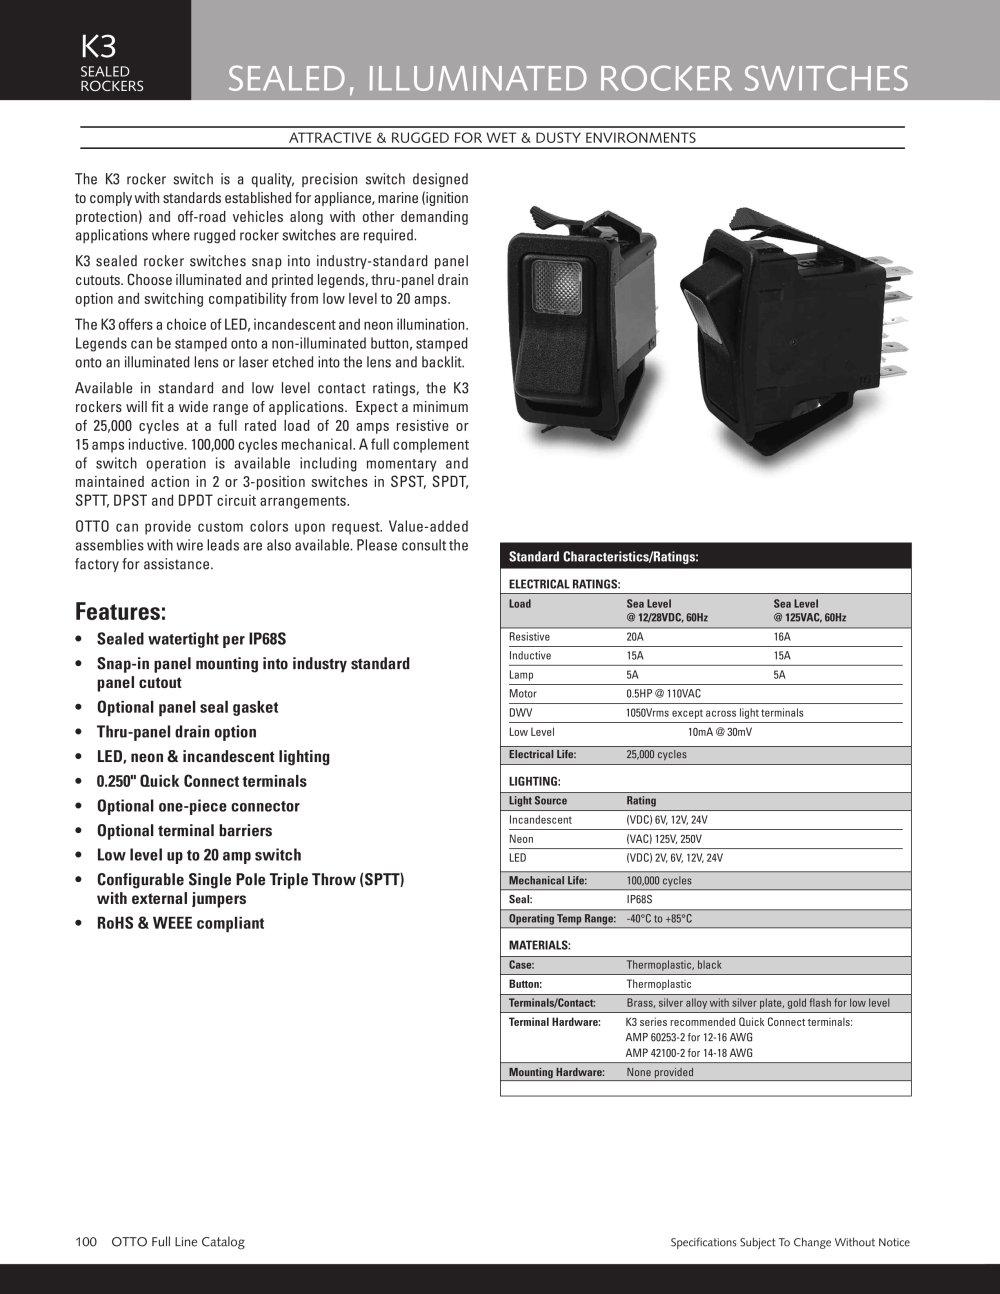 K3 Sealed Illuminated With Legends - OTTO - PDF Catalogue ...